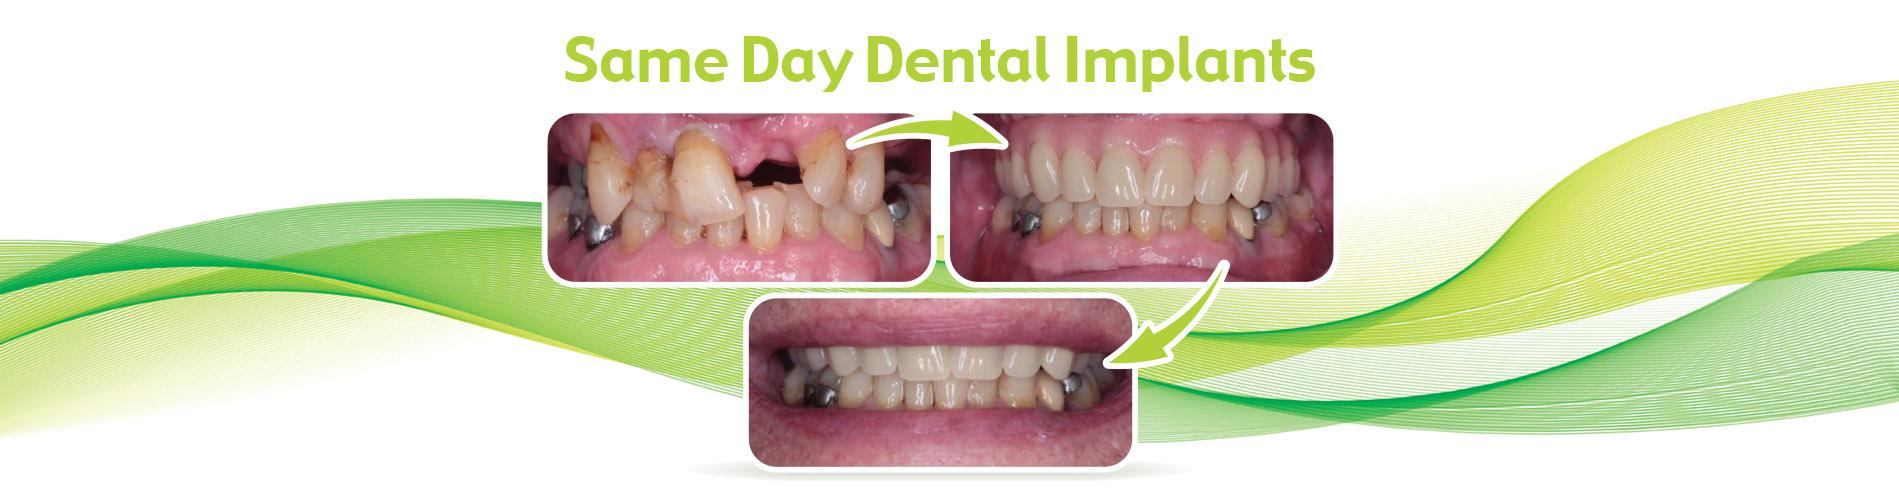 Same-Day-Dental-Implants1